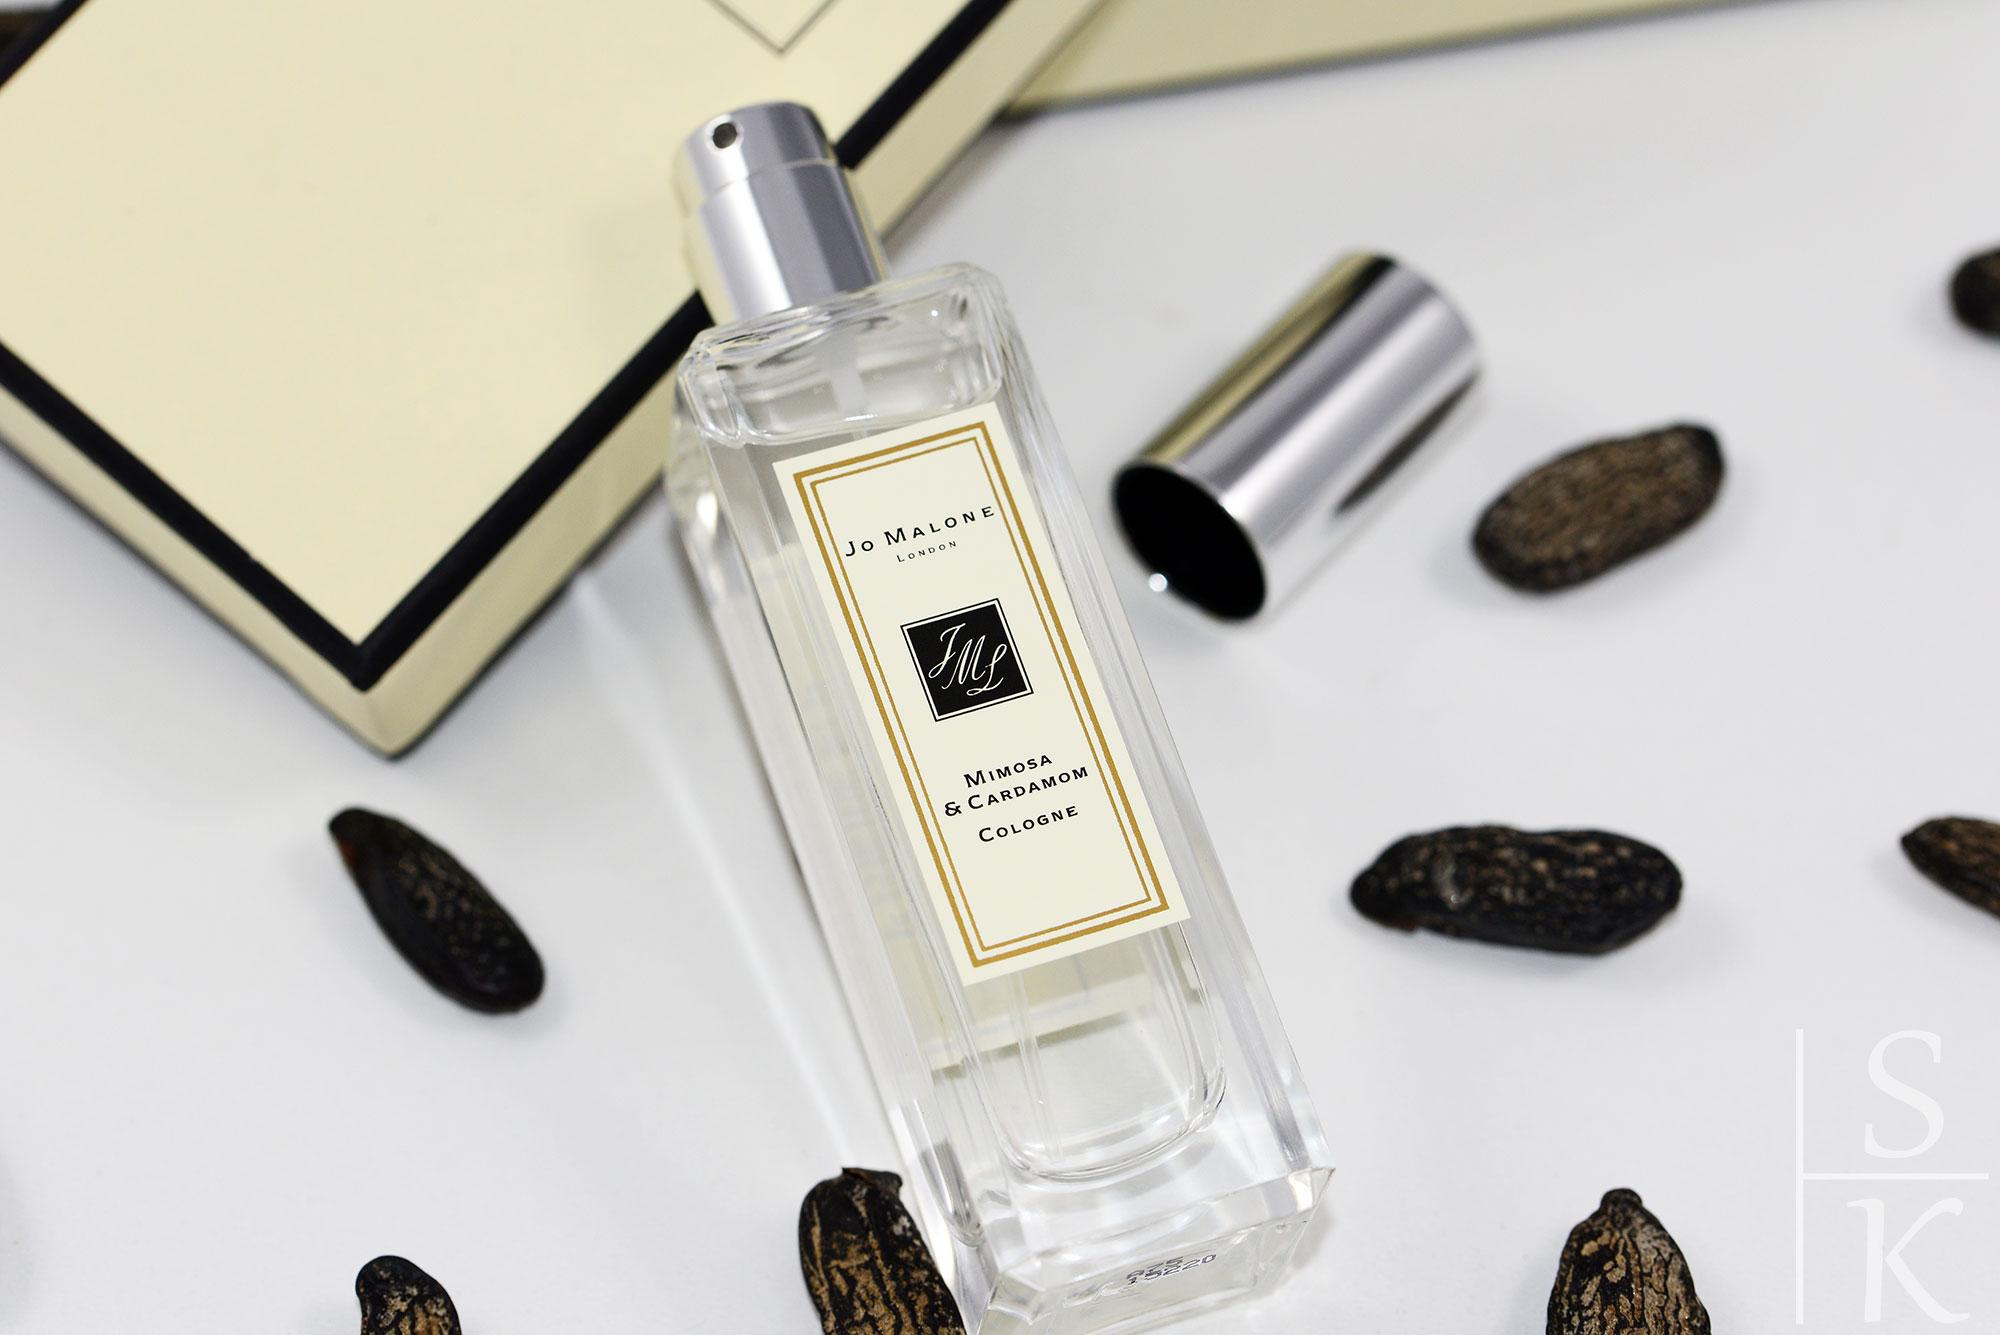 Jo-Malone-Mimosa-Cardamom-04